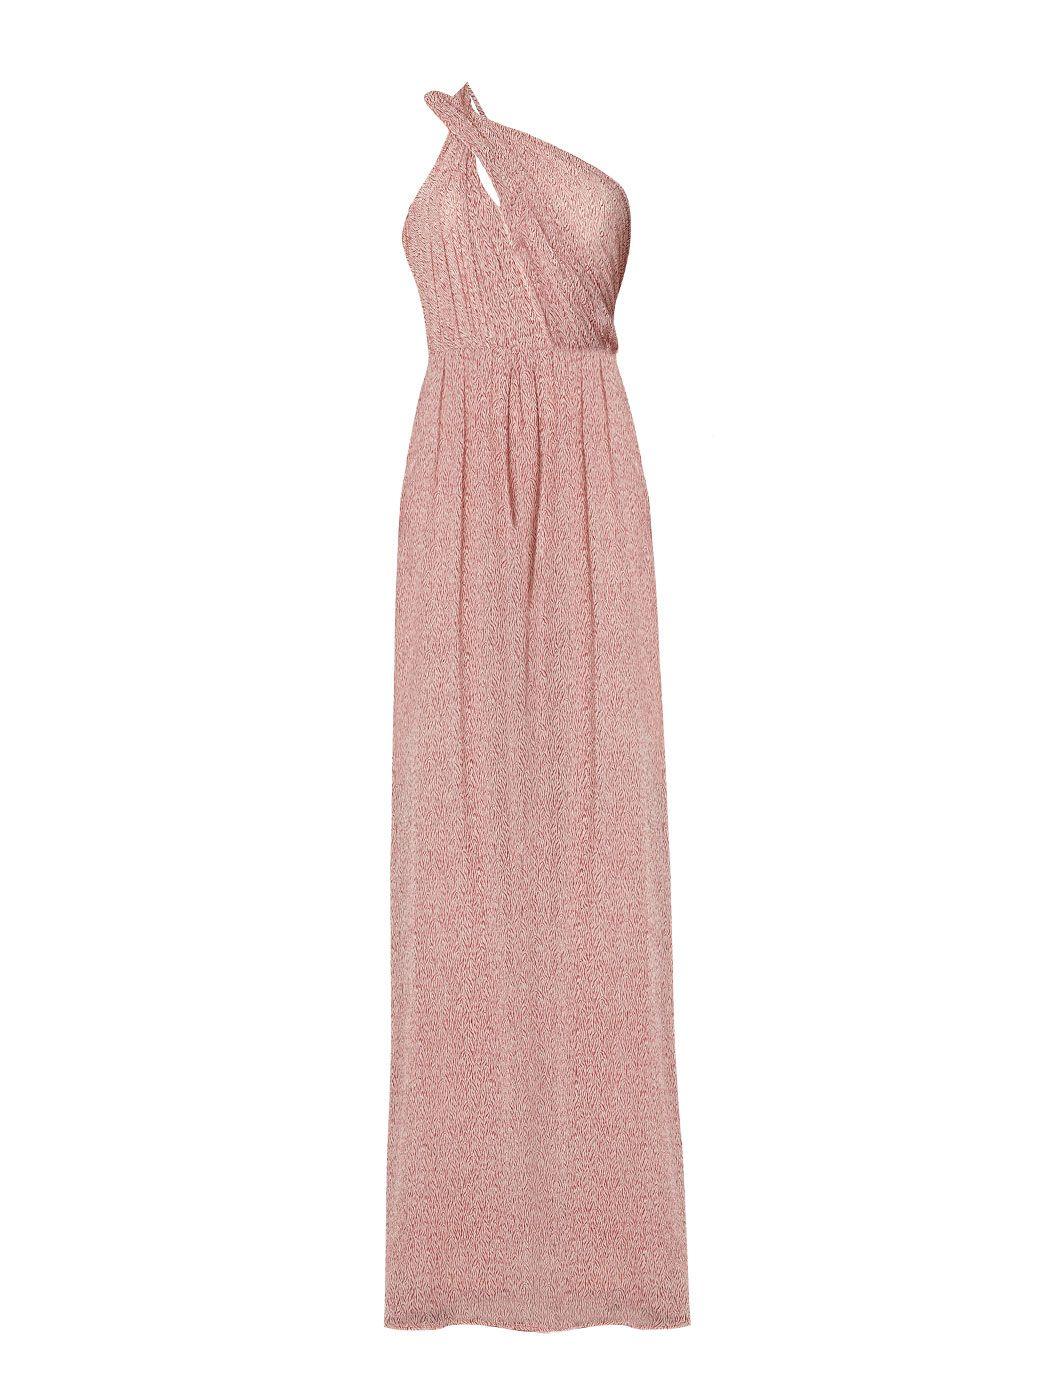 imagen producto   Vestidos/Dresses   Pinterest   Vestidos fluidos ...